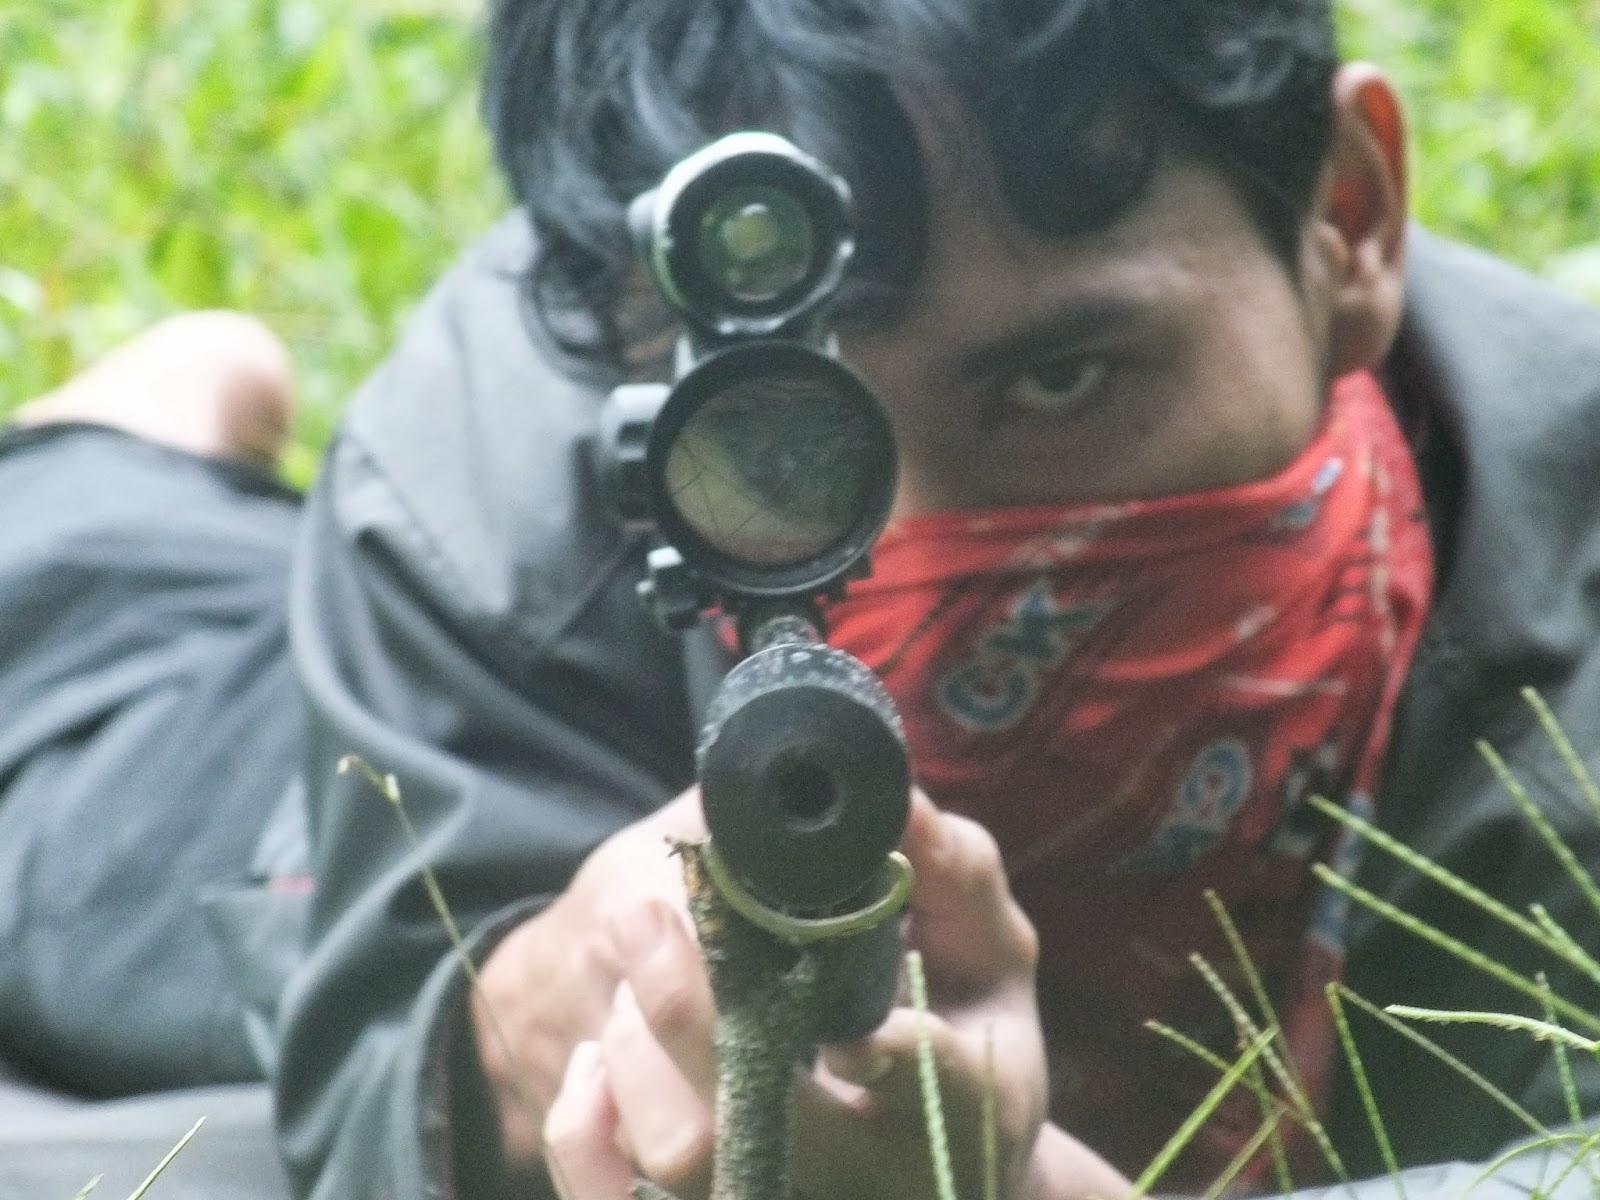 Belajar Membidik Dan Pegang Senjata